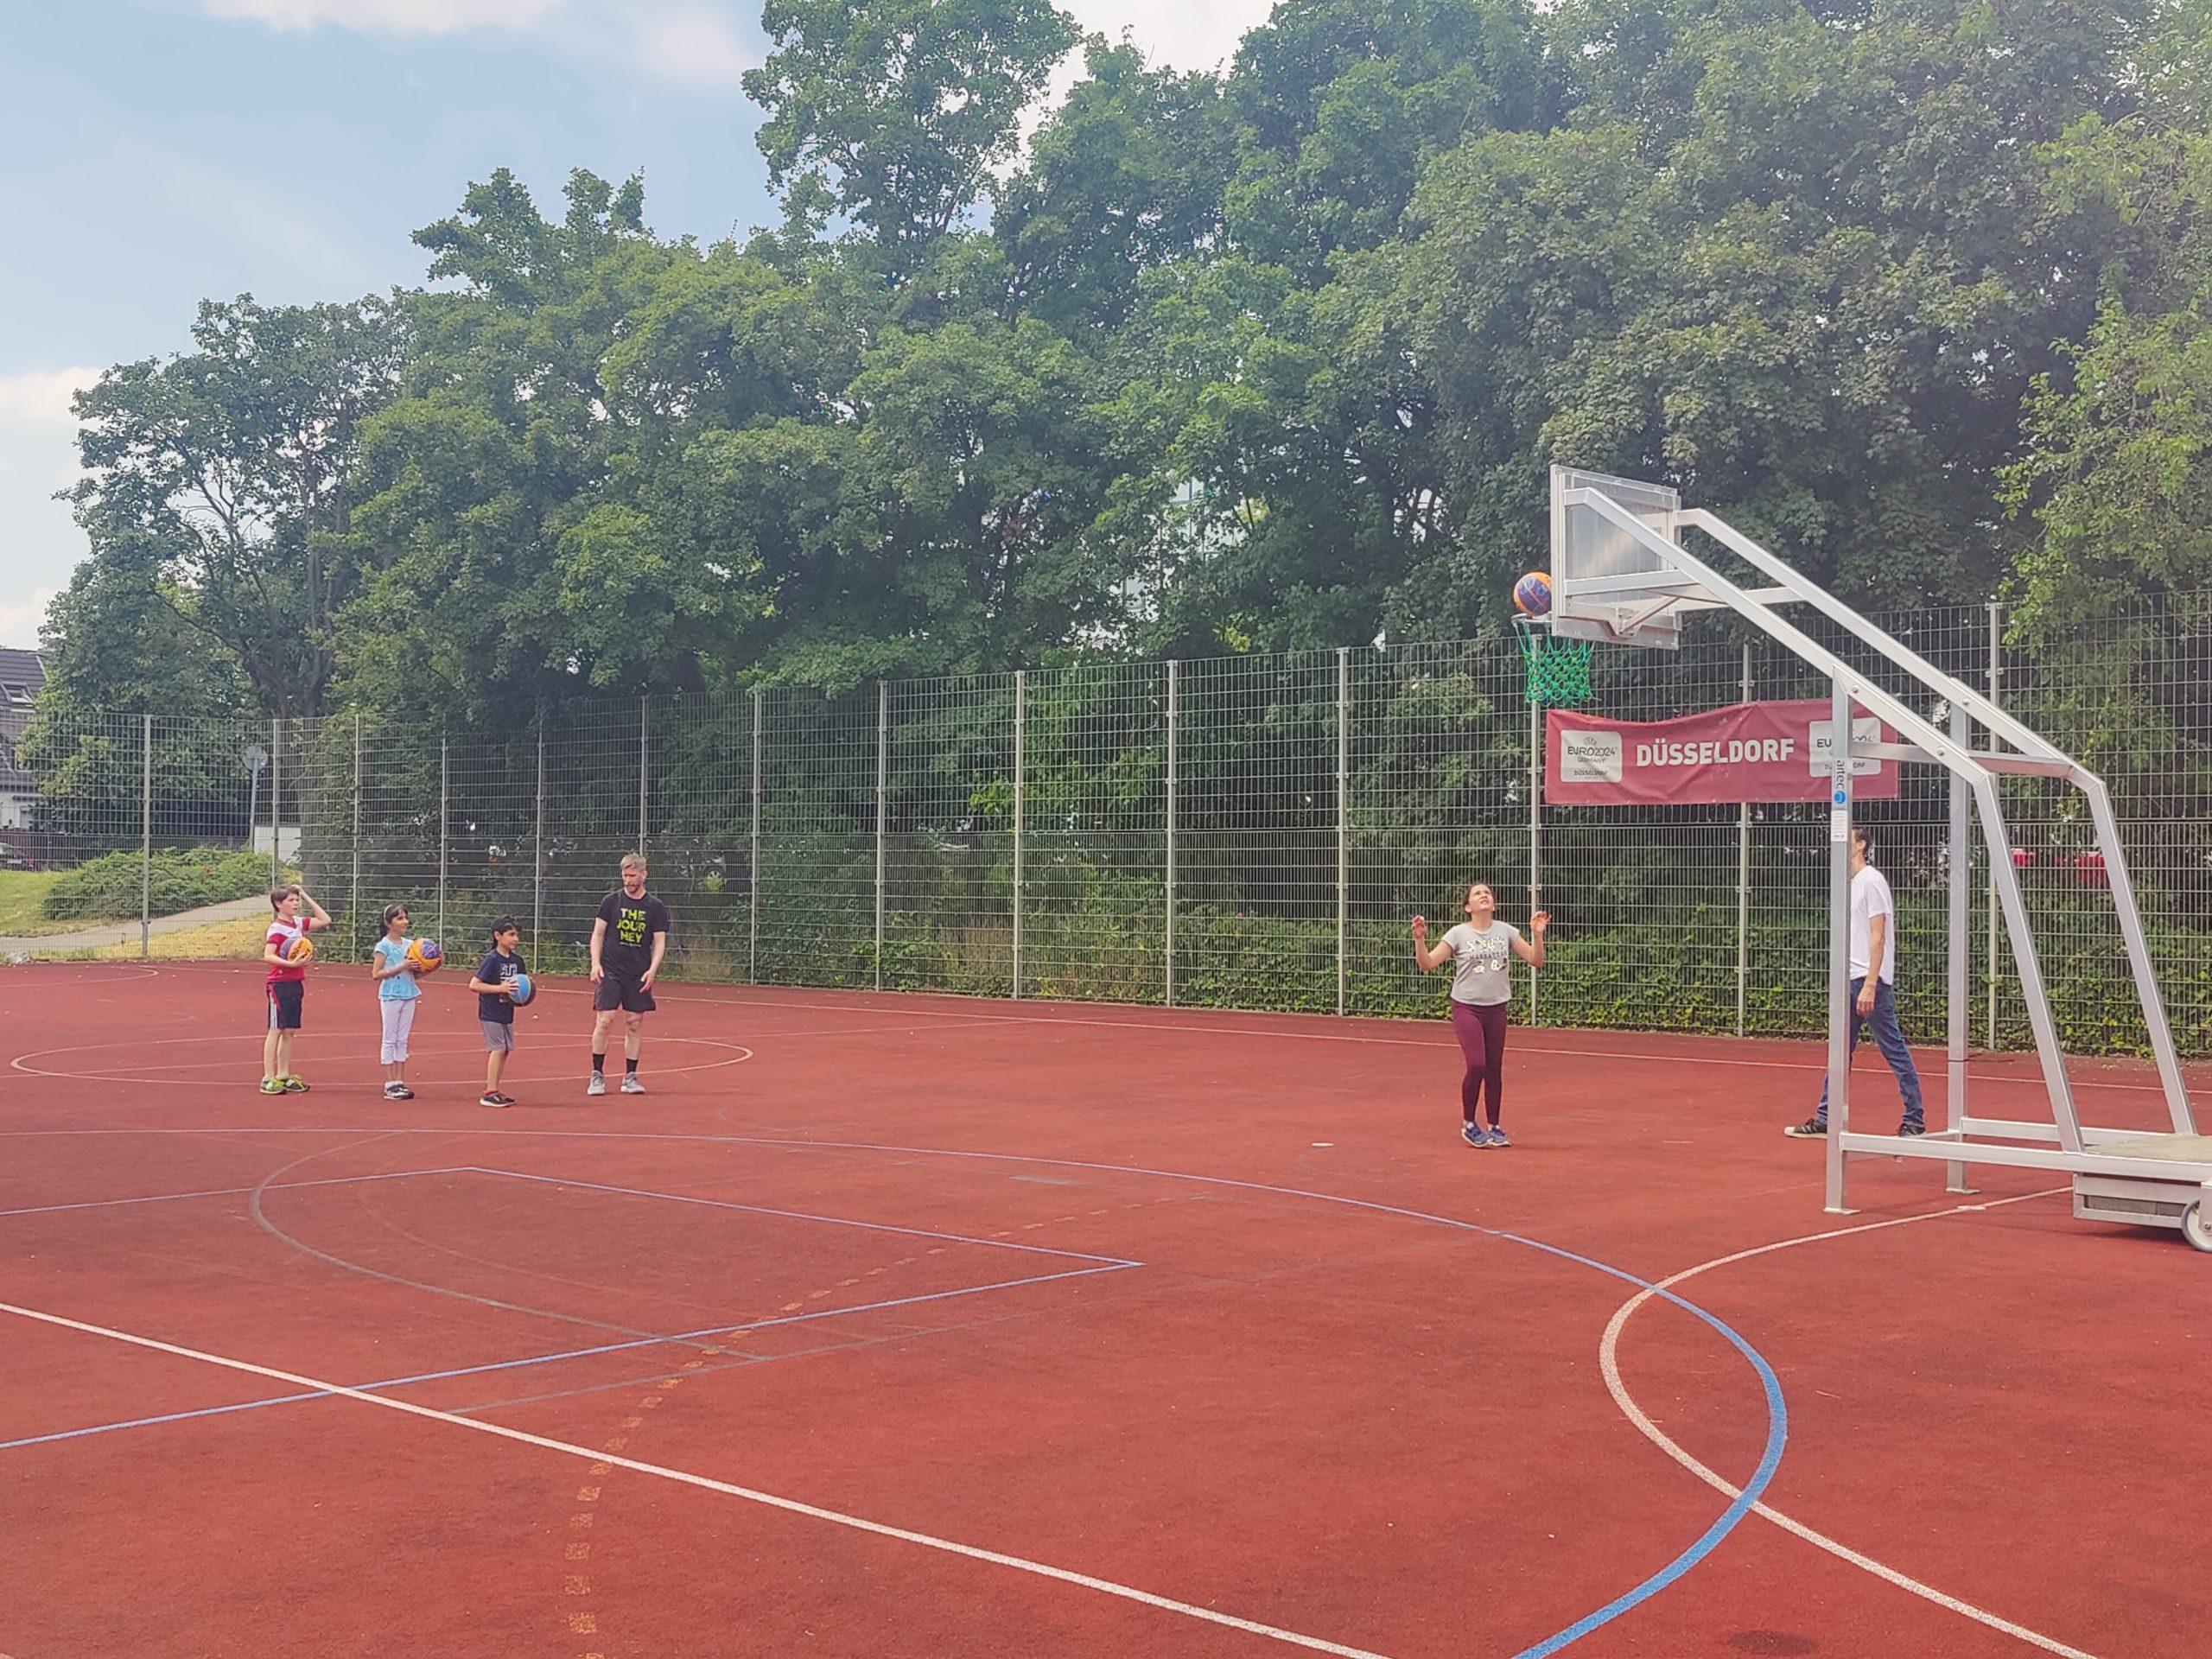 Kinder spielen 3x3 Basketball